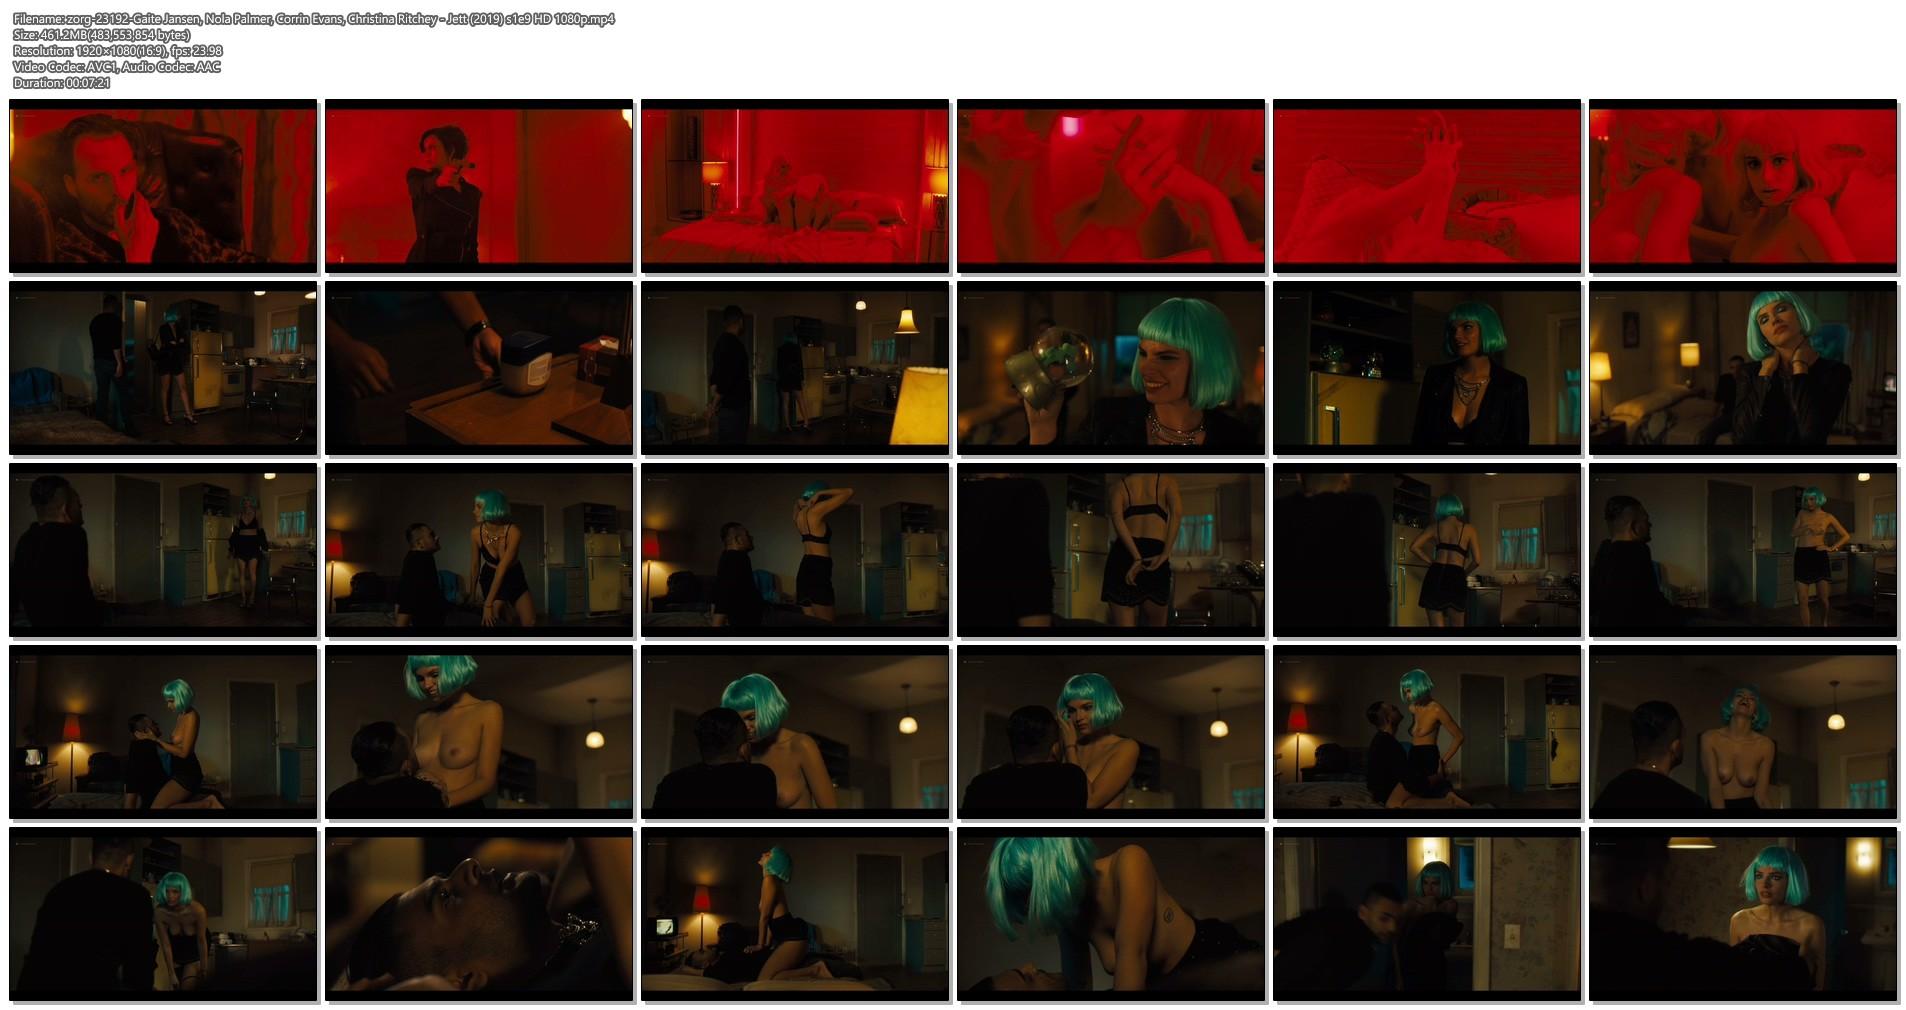 Gaite Jansen nude sex Nola Palmer nude too - Jett (2019) s1e9 HD 1080p (1)